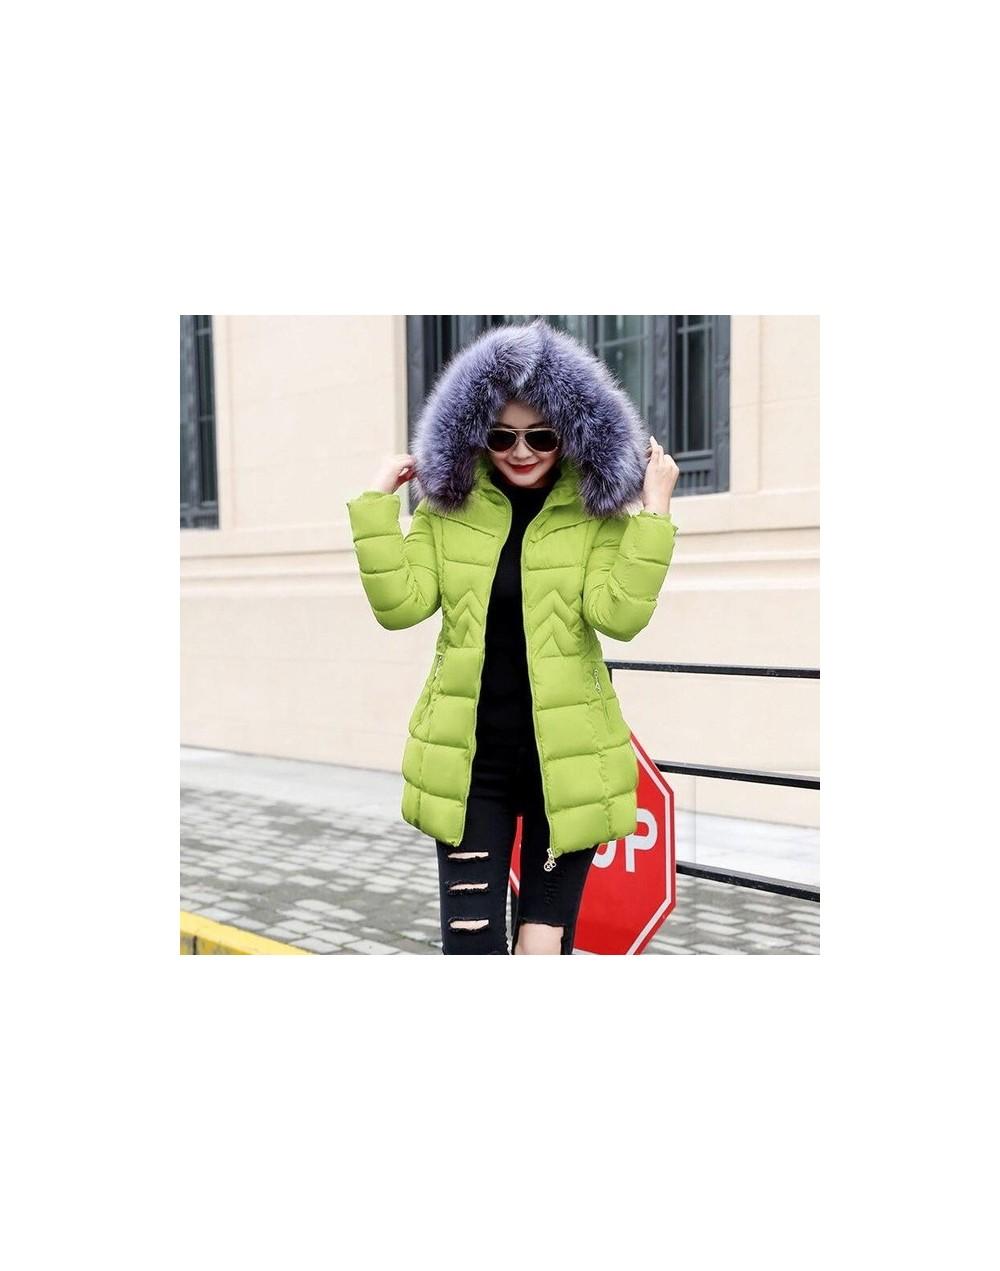 New 2019 Winter Jacket Women thick Winter Coat Lady Clothing Female Jackets Long Parkas Fake fur collar Parka down cotton ja...